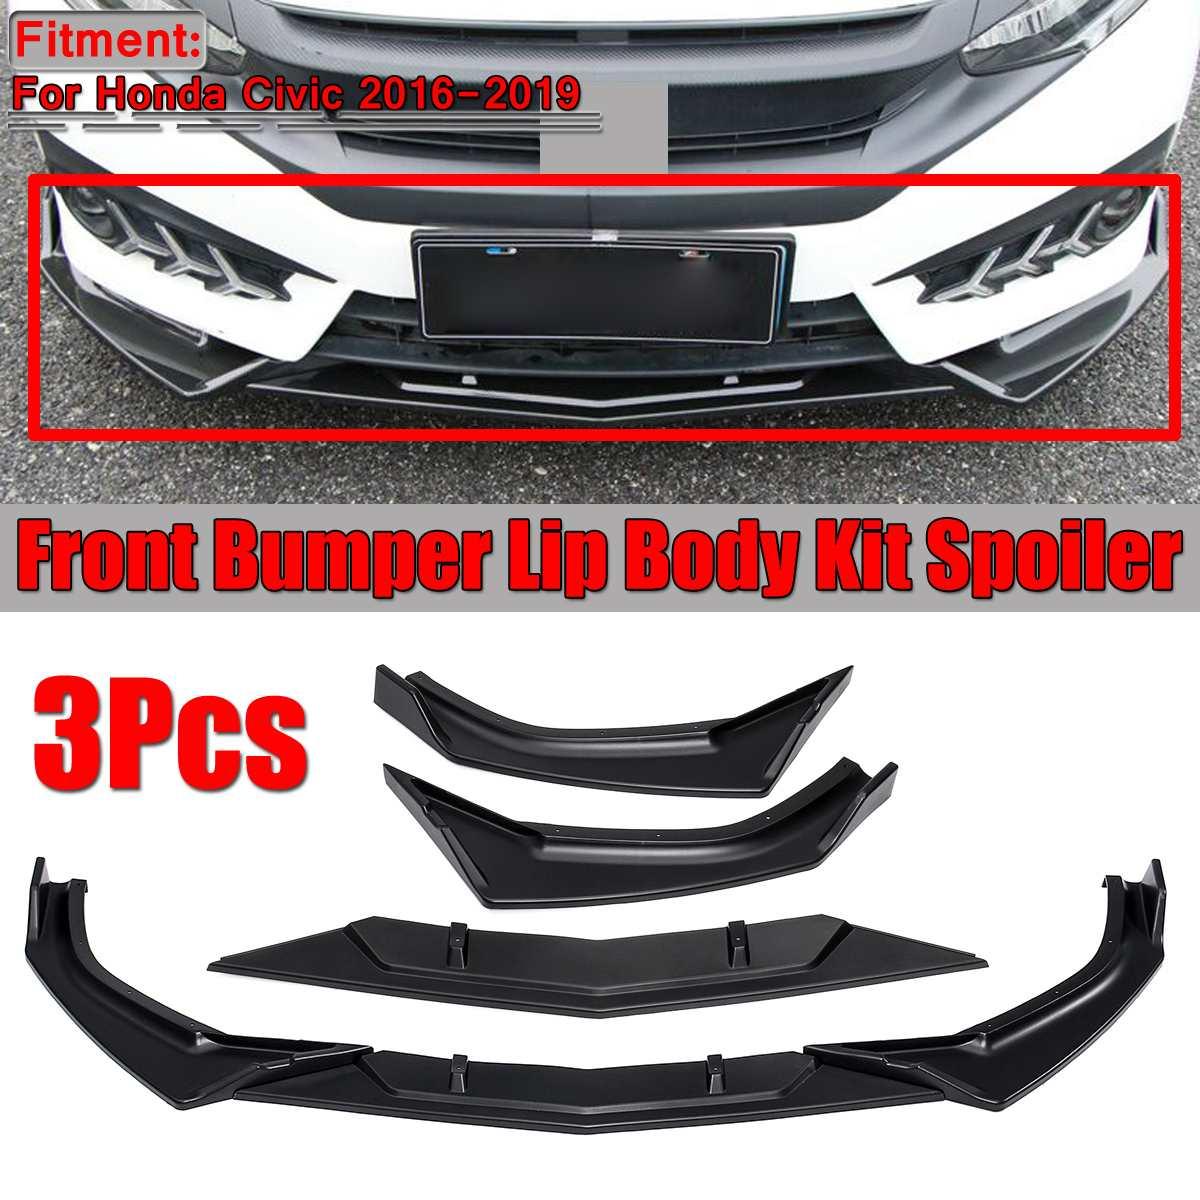 Matte Black Rear Bumper Skirts Protect Cover For Honda Civic Sedan 2016-2018